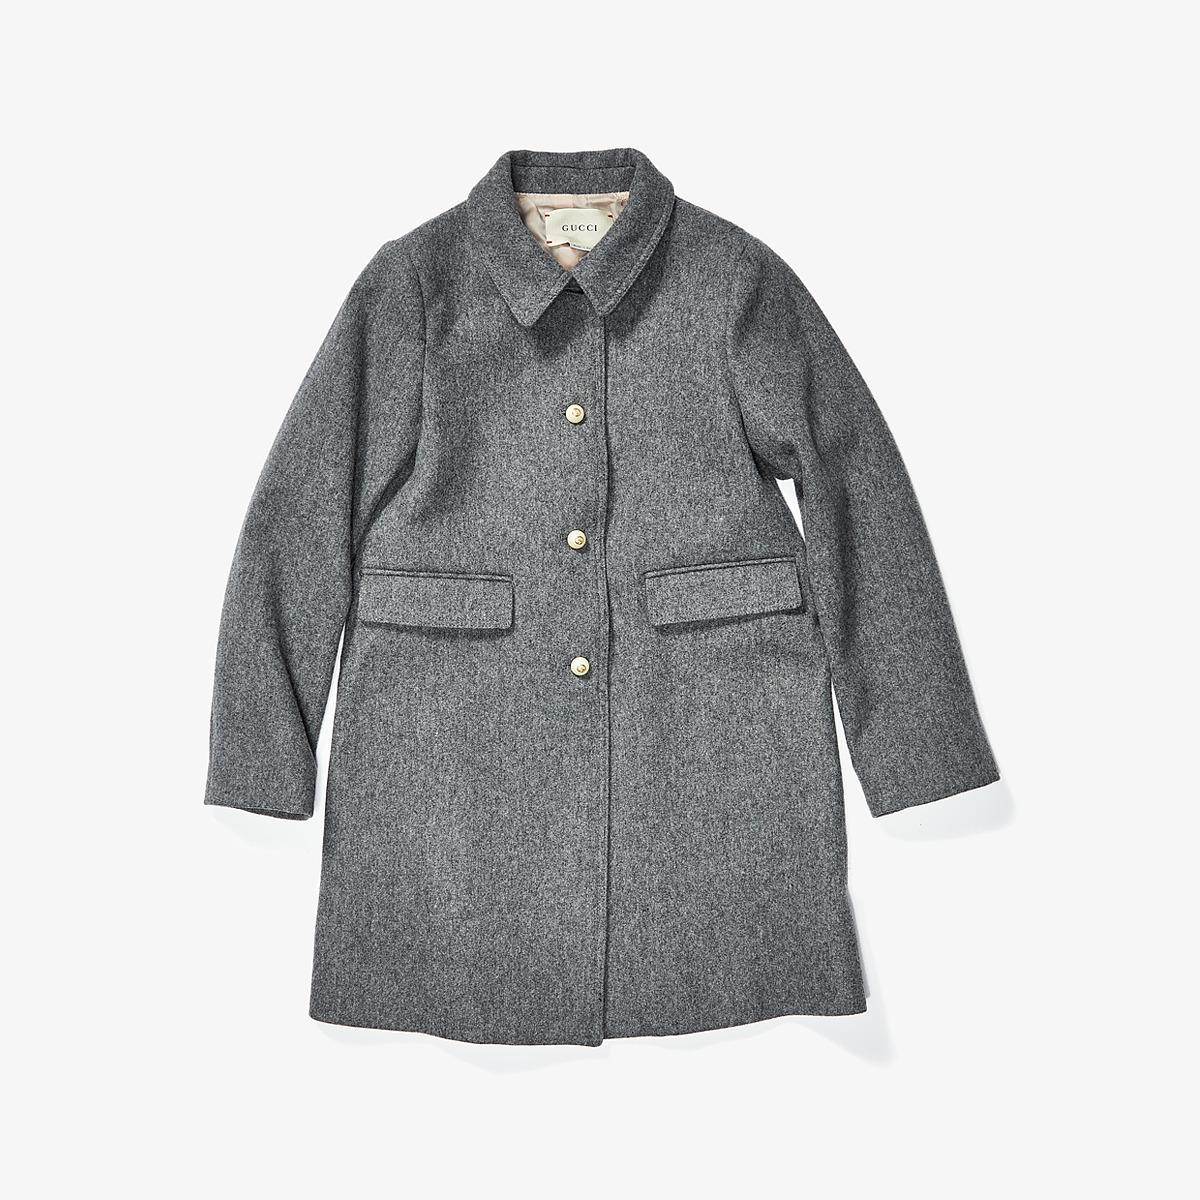 Gucci Kids - Coat 477728XB817 (Little Kids/Big Kids) (Light Grey Melange) Girls Coat